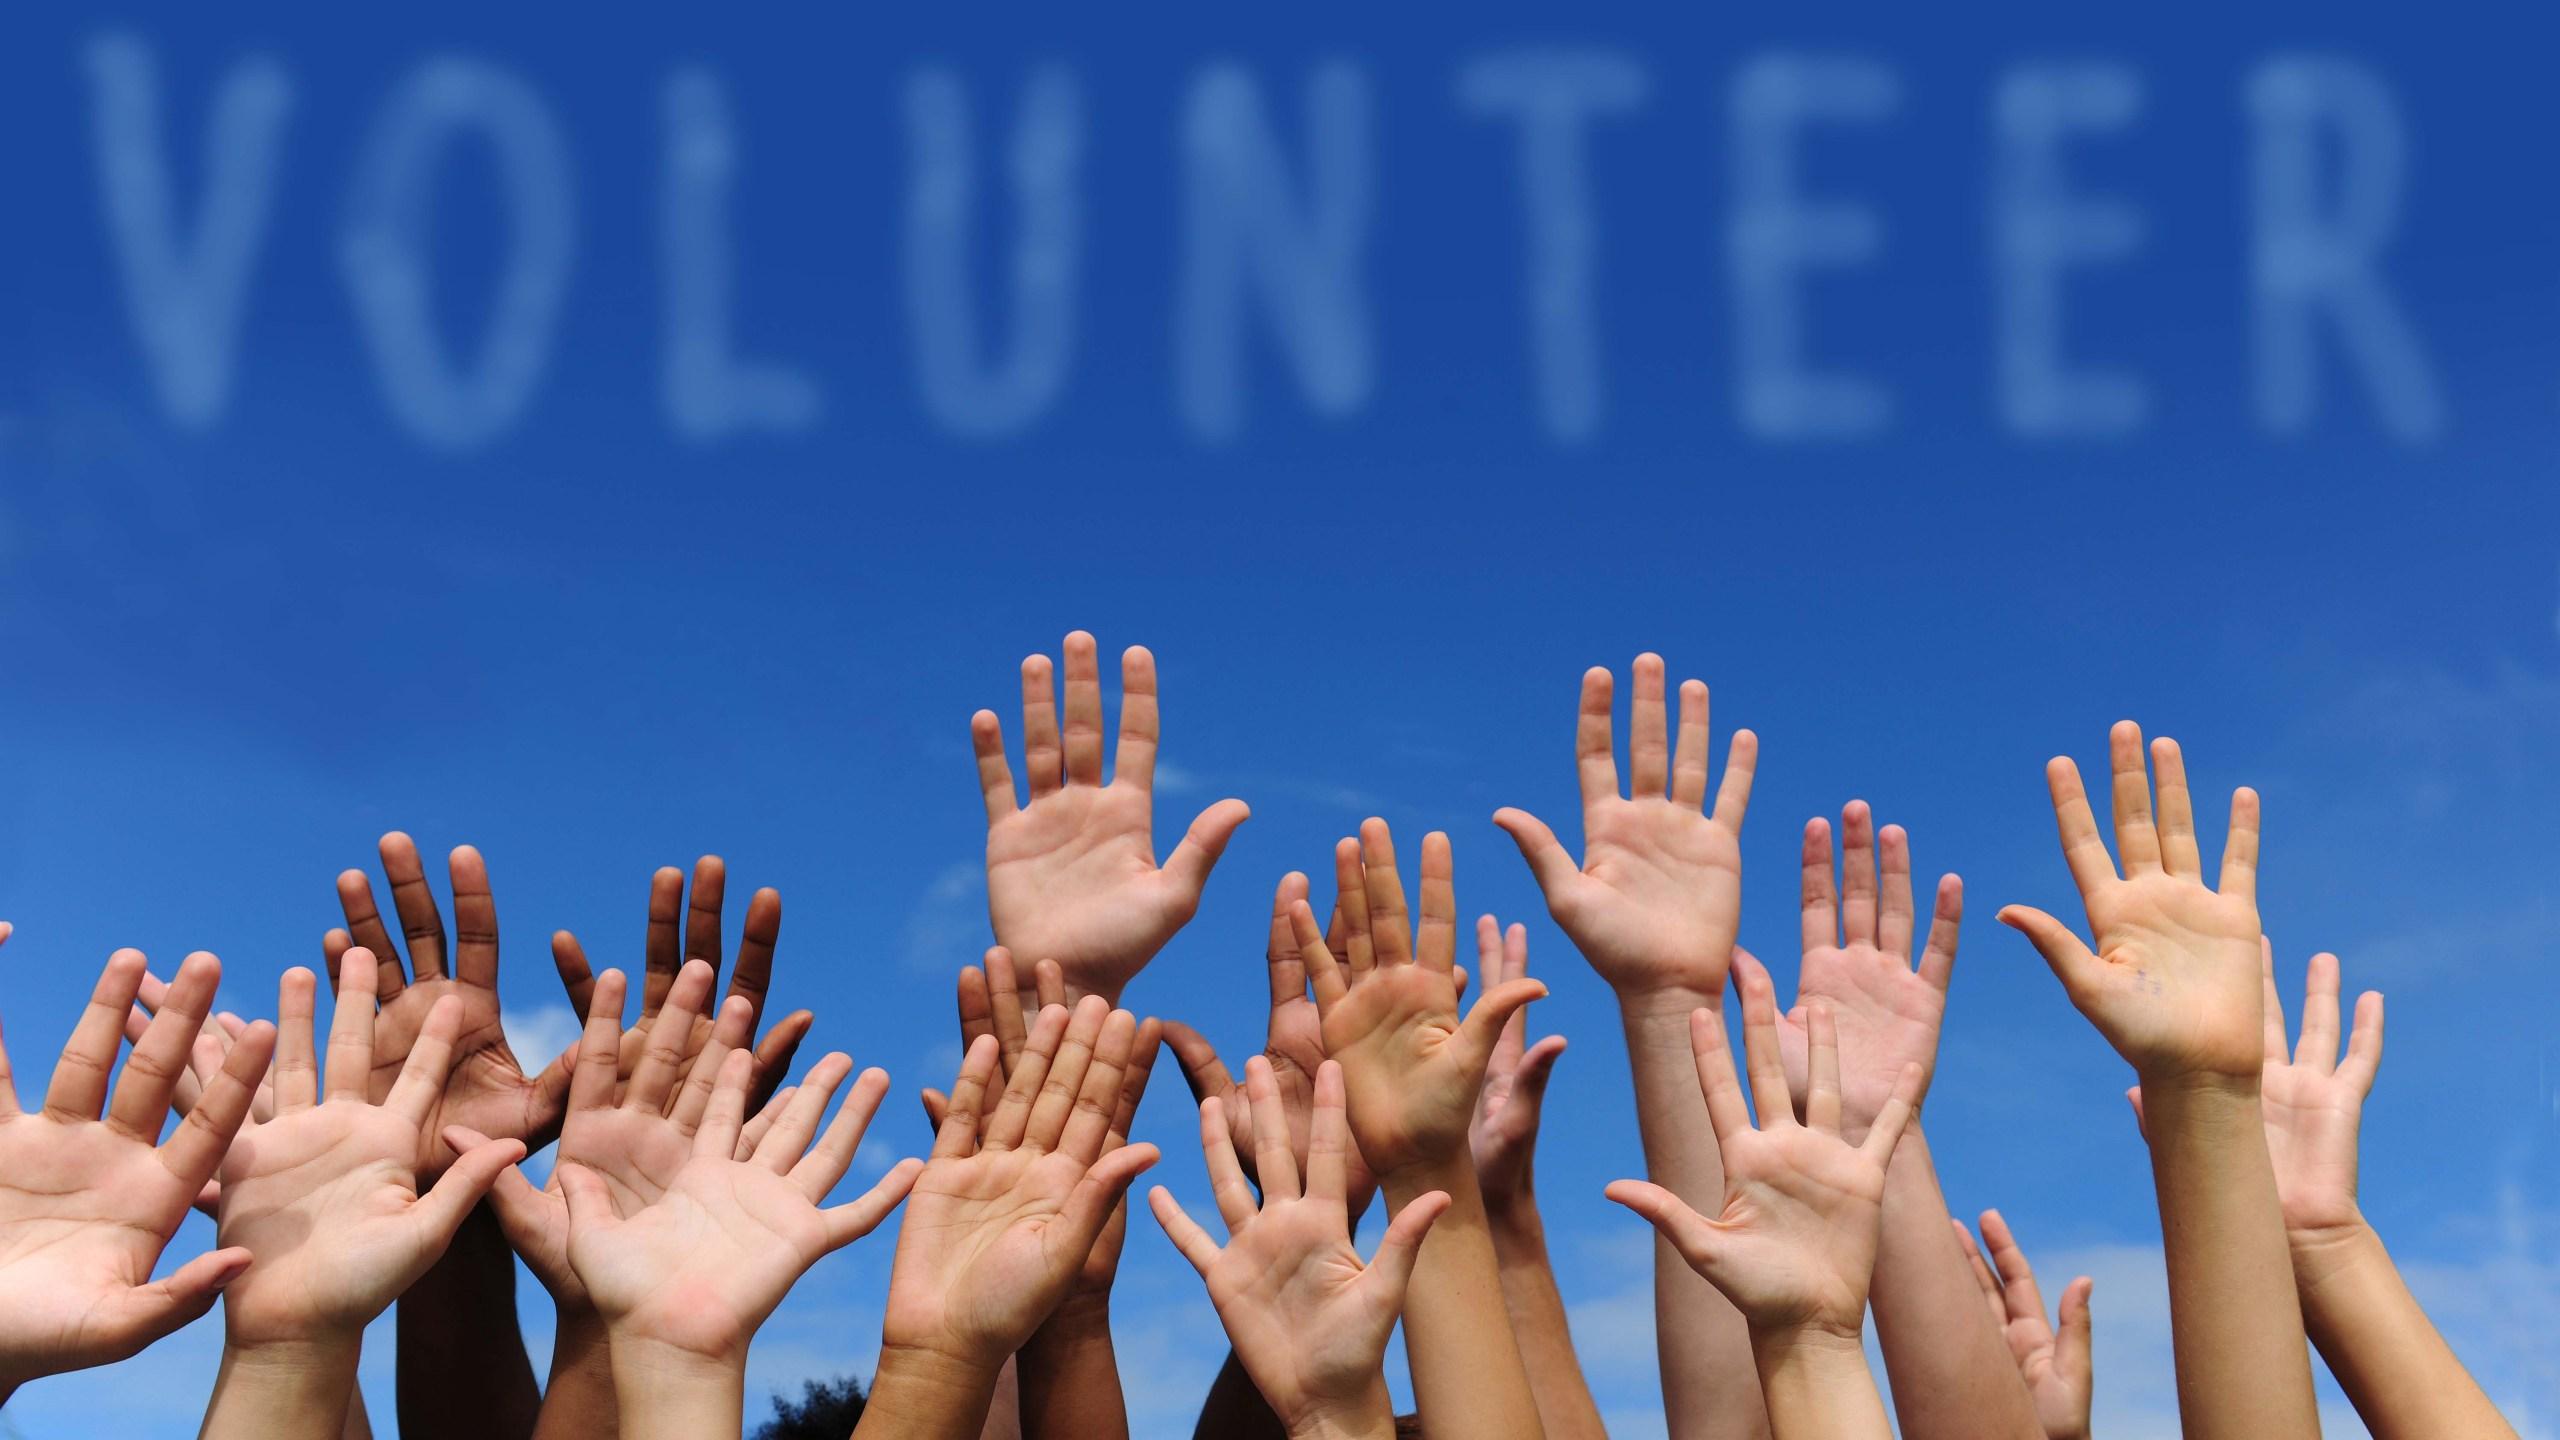 volunteer group raising hands against blue sky background_1554207438188